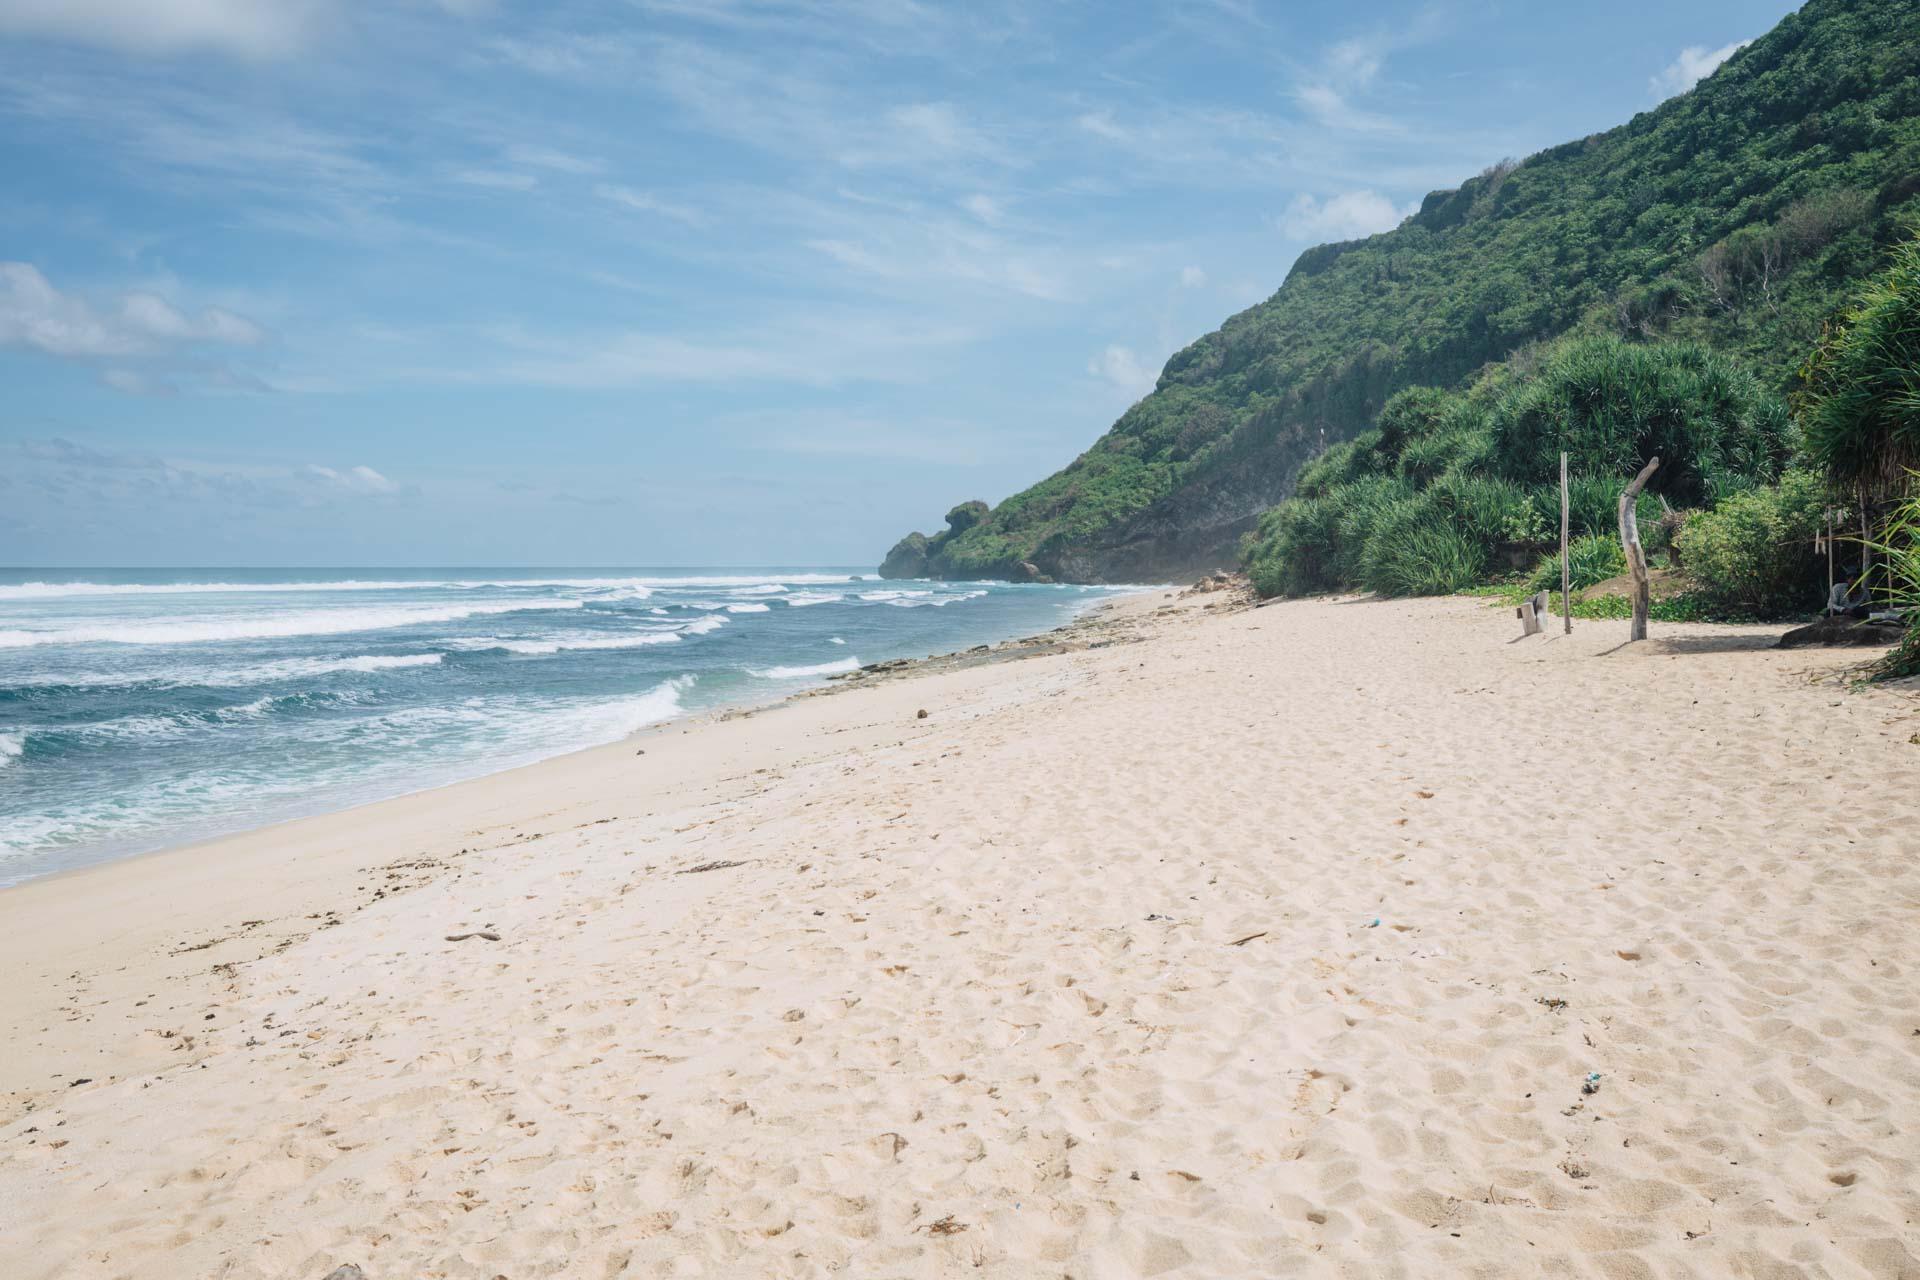 nyang nyang beach, nyang nyang, pantai nyang nyang